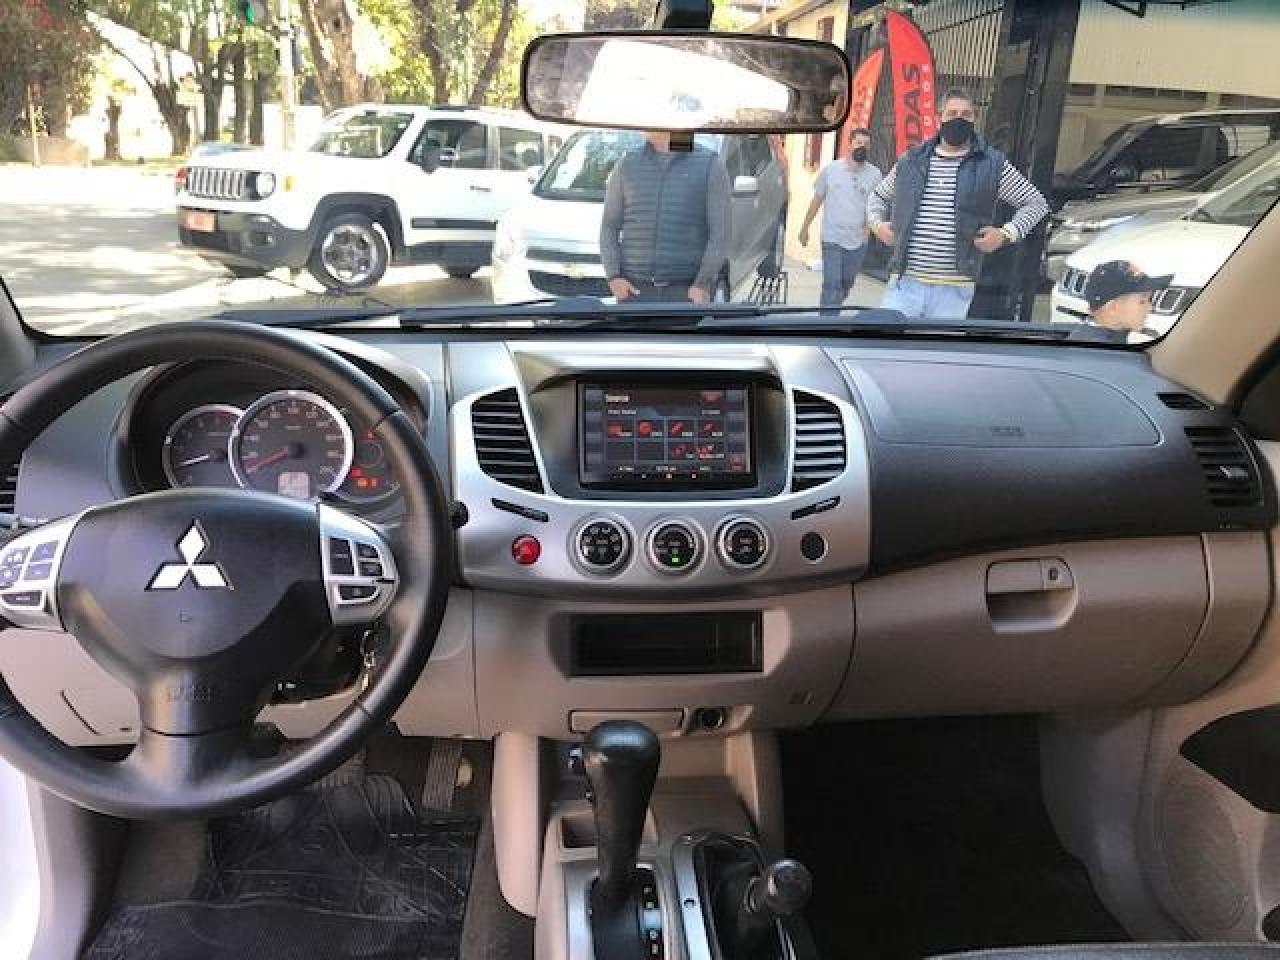 L 200 Triton 3.2 16V HPE 4X4 CABINE DUPLA TURBO DIESEL INTERCOOLER AUTOMÁTICO